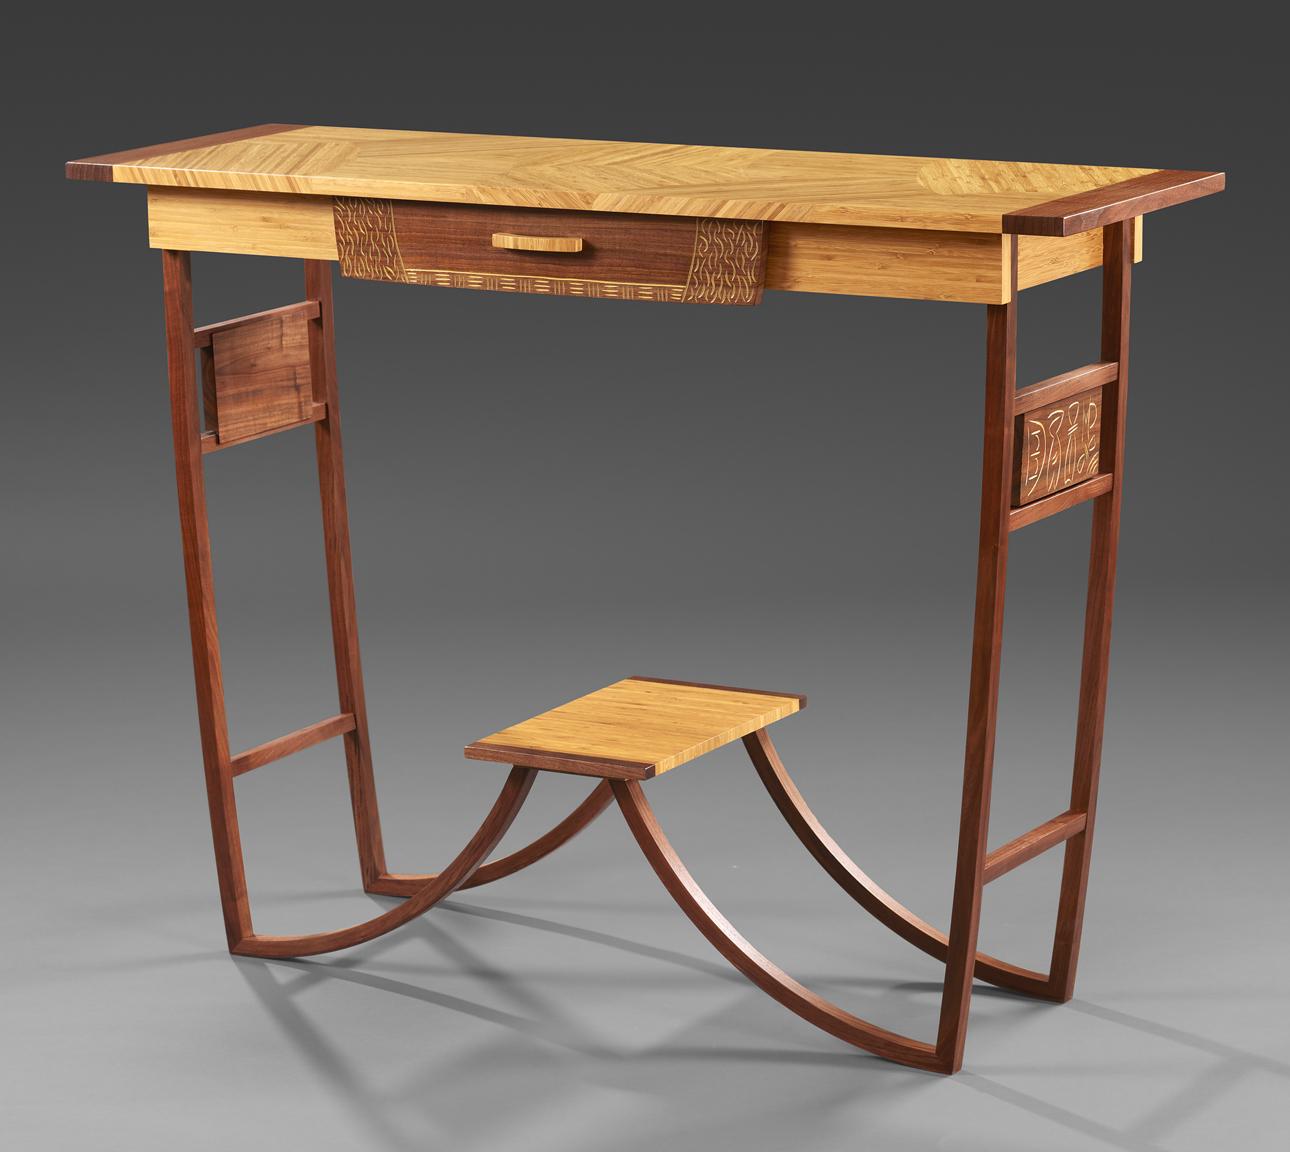 "Entryway Table - Narrow band natural Bamboo, American Black Walnut Milk paint, Varnish     36""H x 48""W x 16""D"